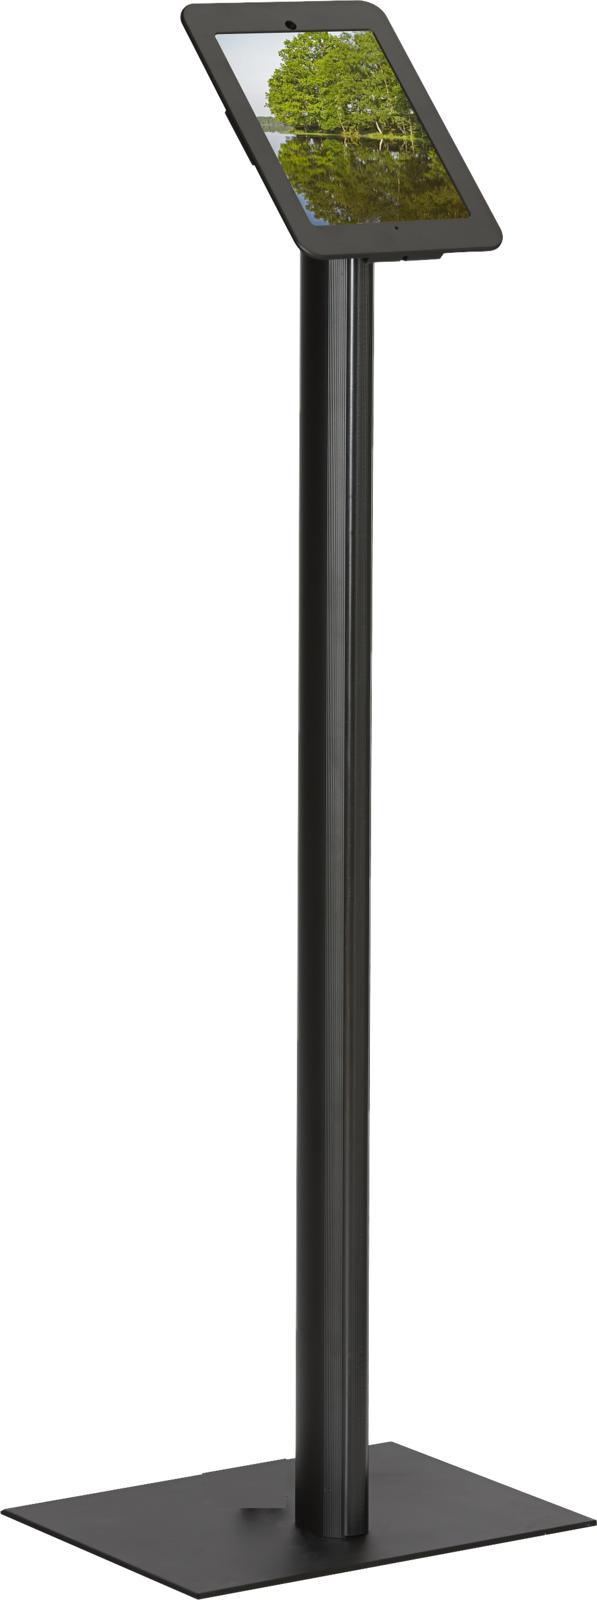 Safeware Frame med golvstativ (iPad mini) - Svart